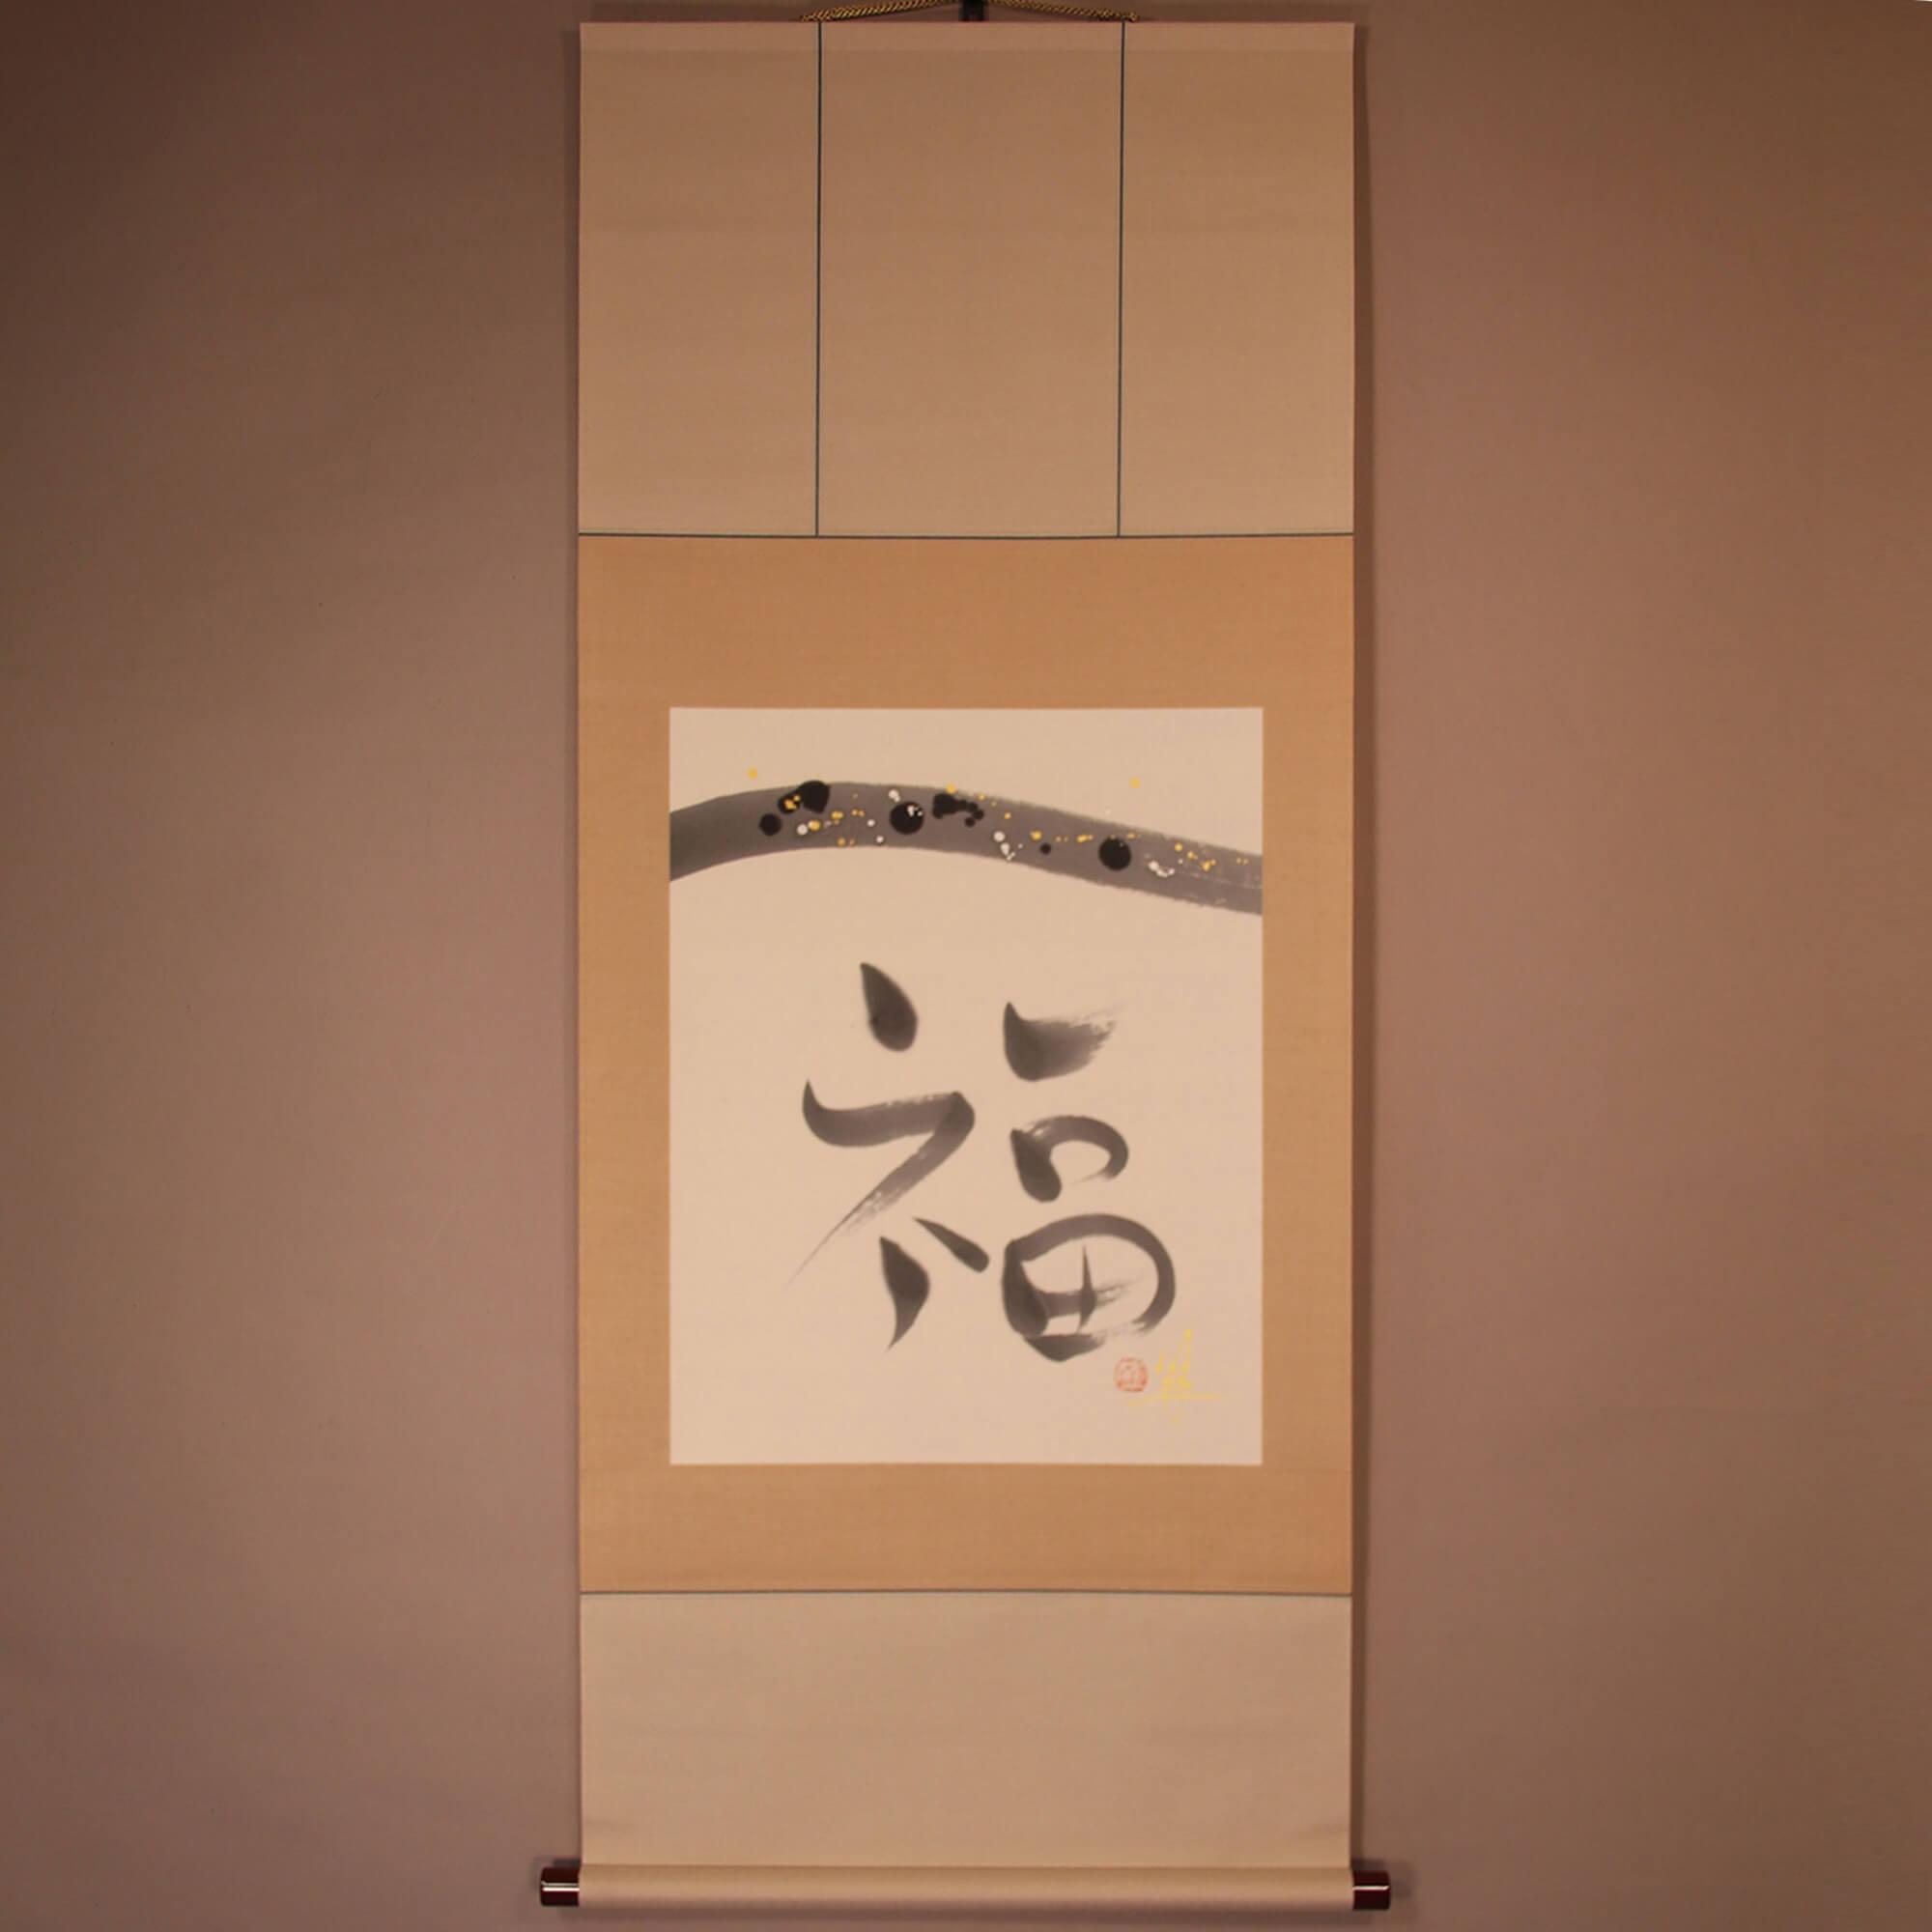 Happiness / Sakai Hōichi